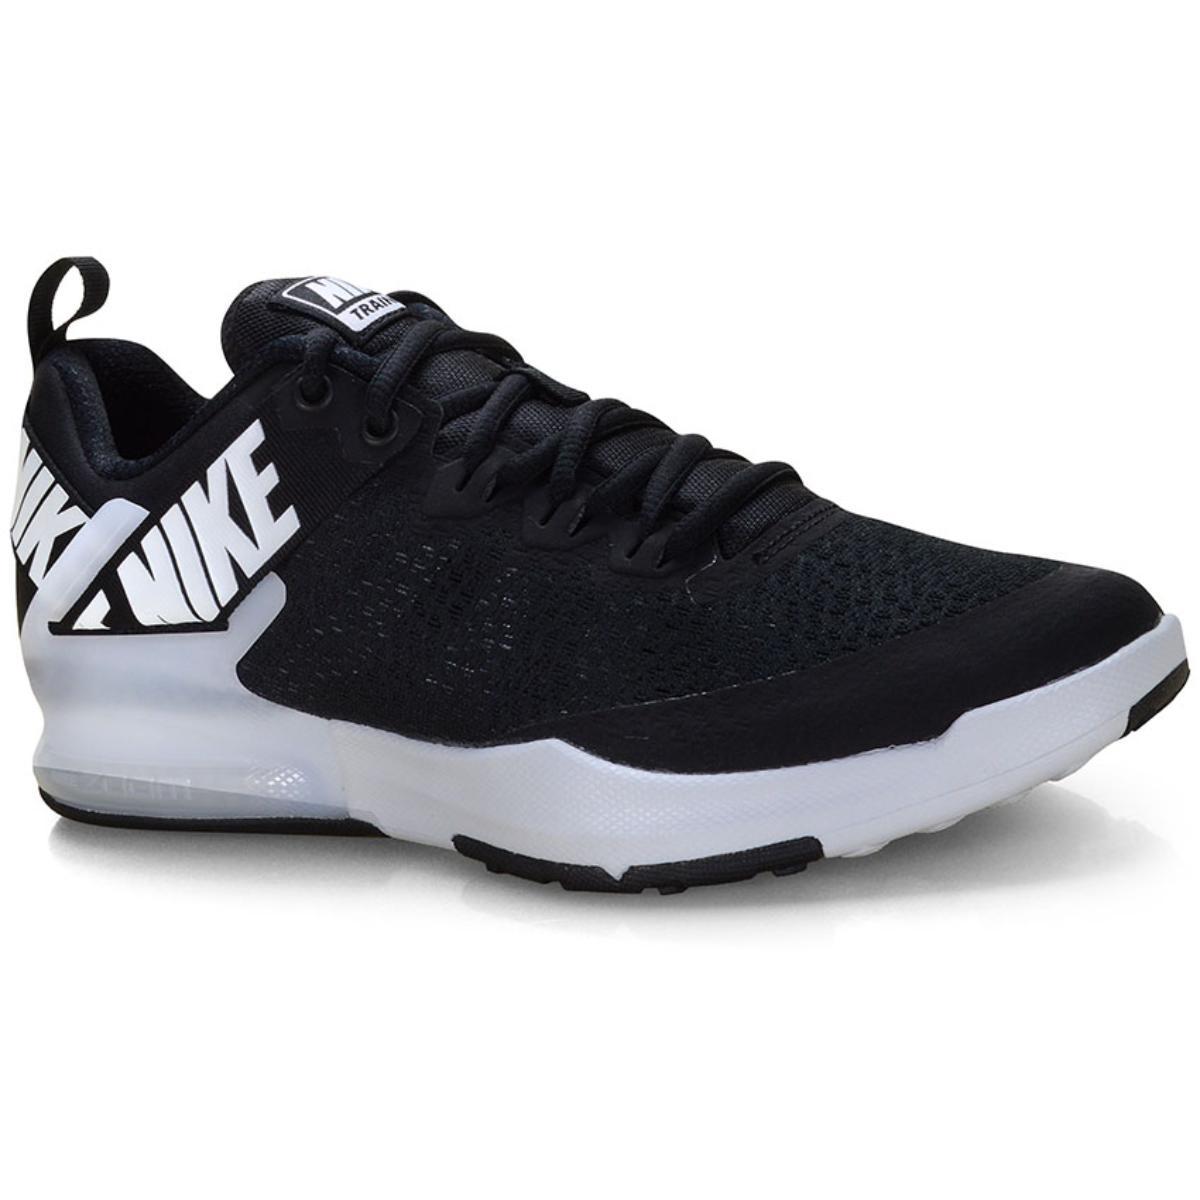 Tênis Masculino Nike Ao4403-001 Zoom Domination tr 2 Preto/branco